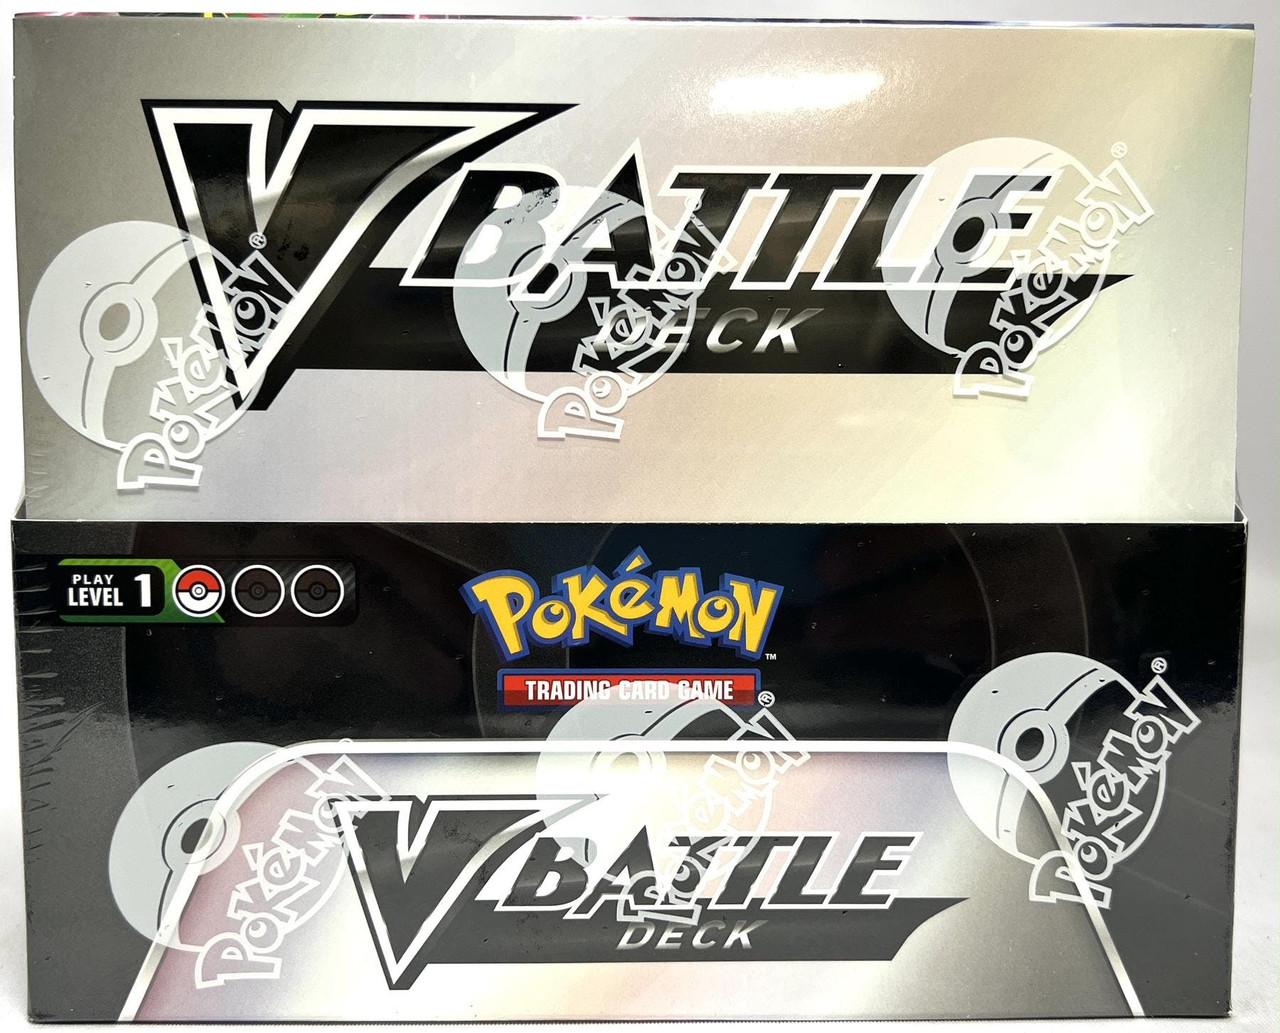 Pokemon Rayquaza V and Noivern V Battle Deck Box